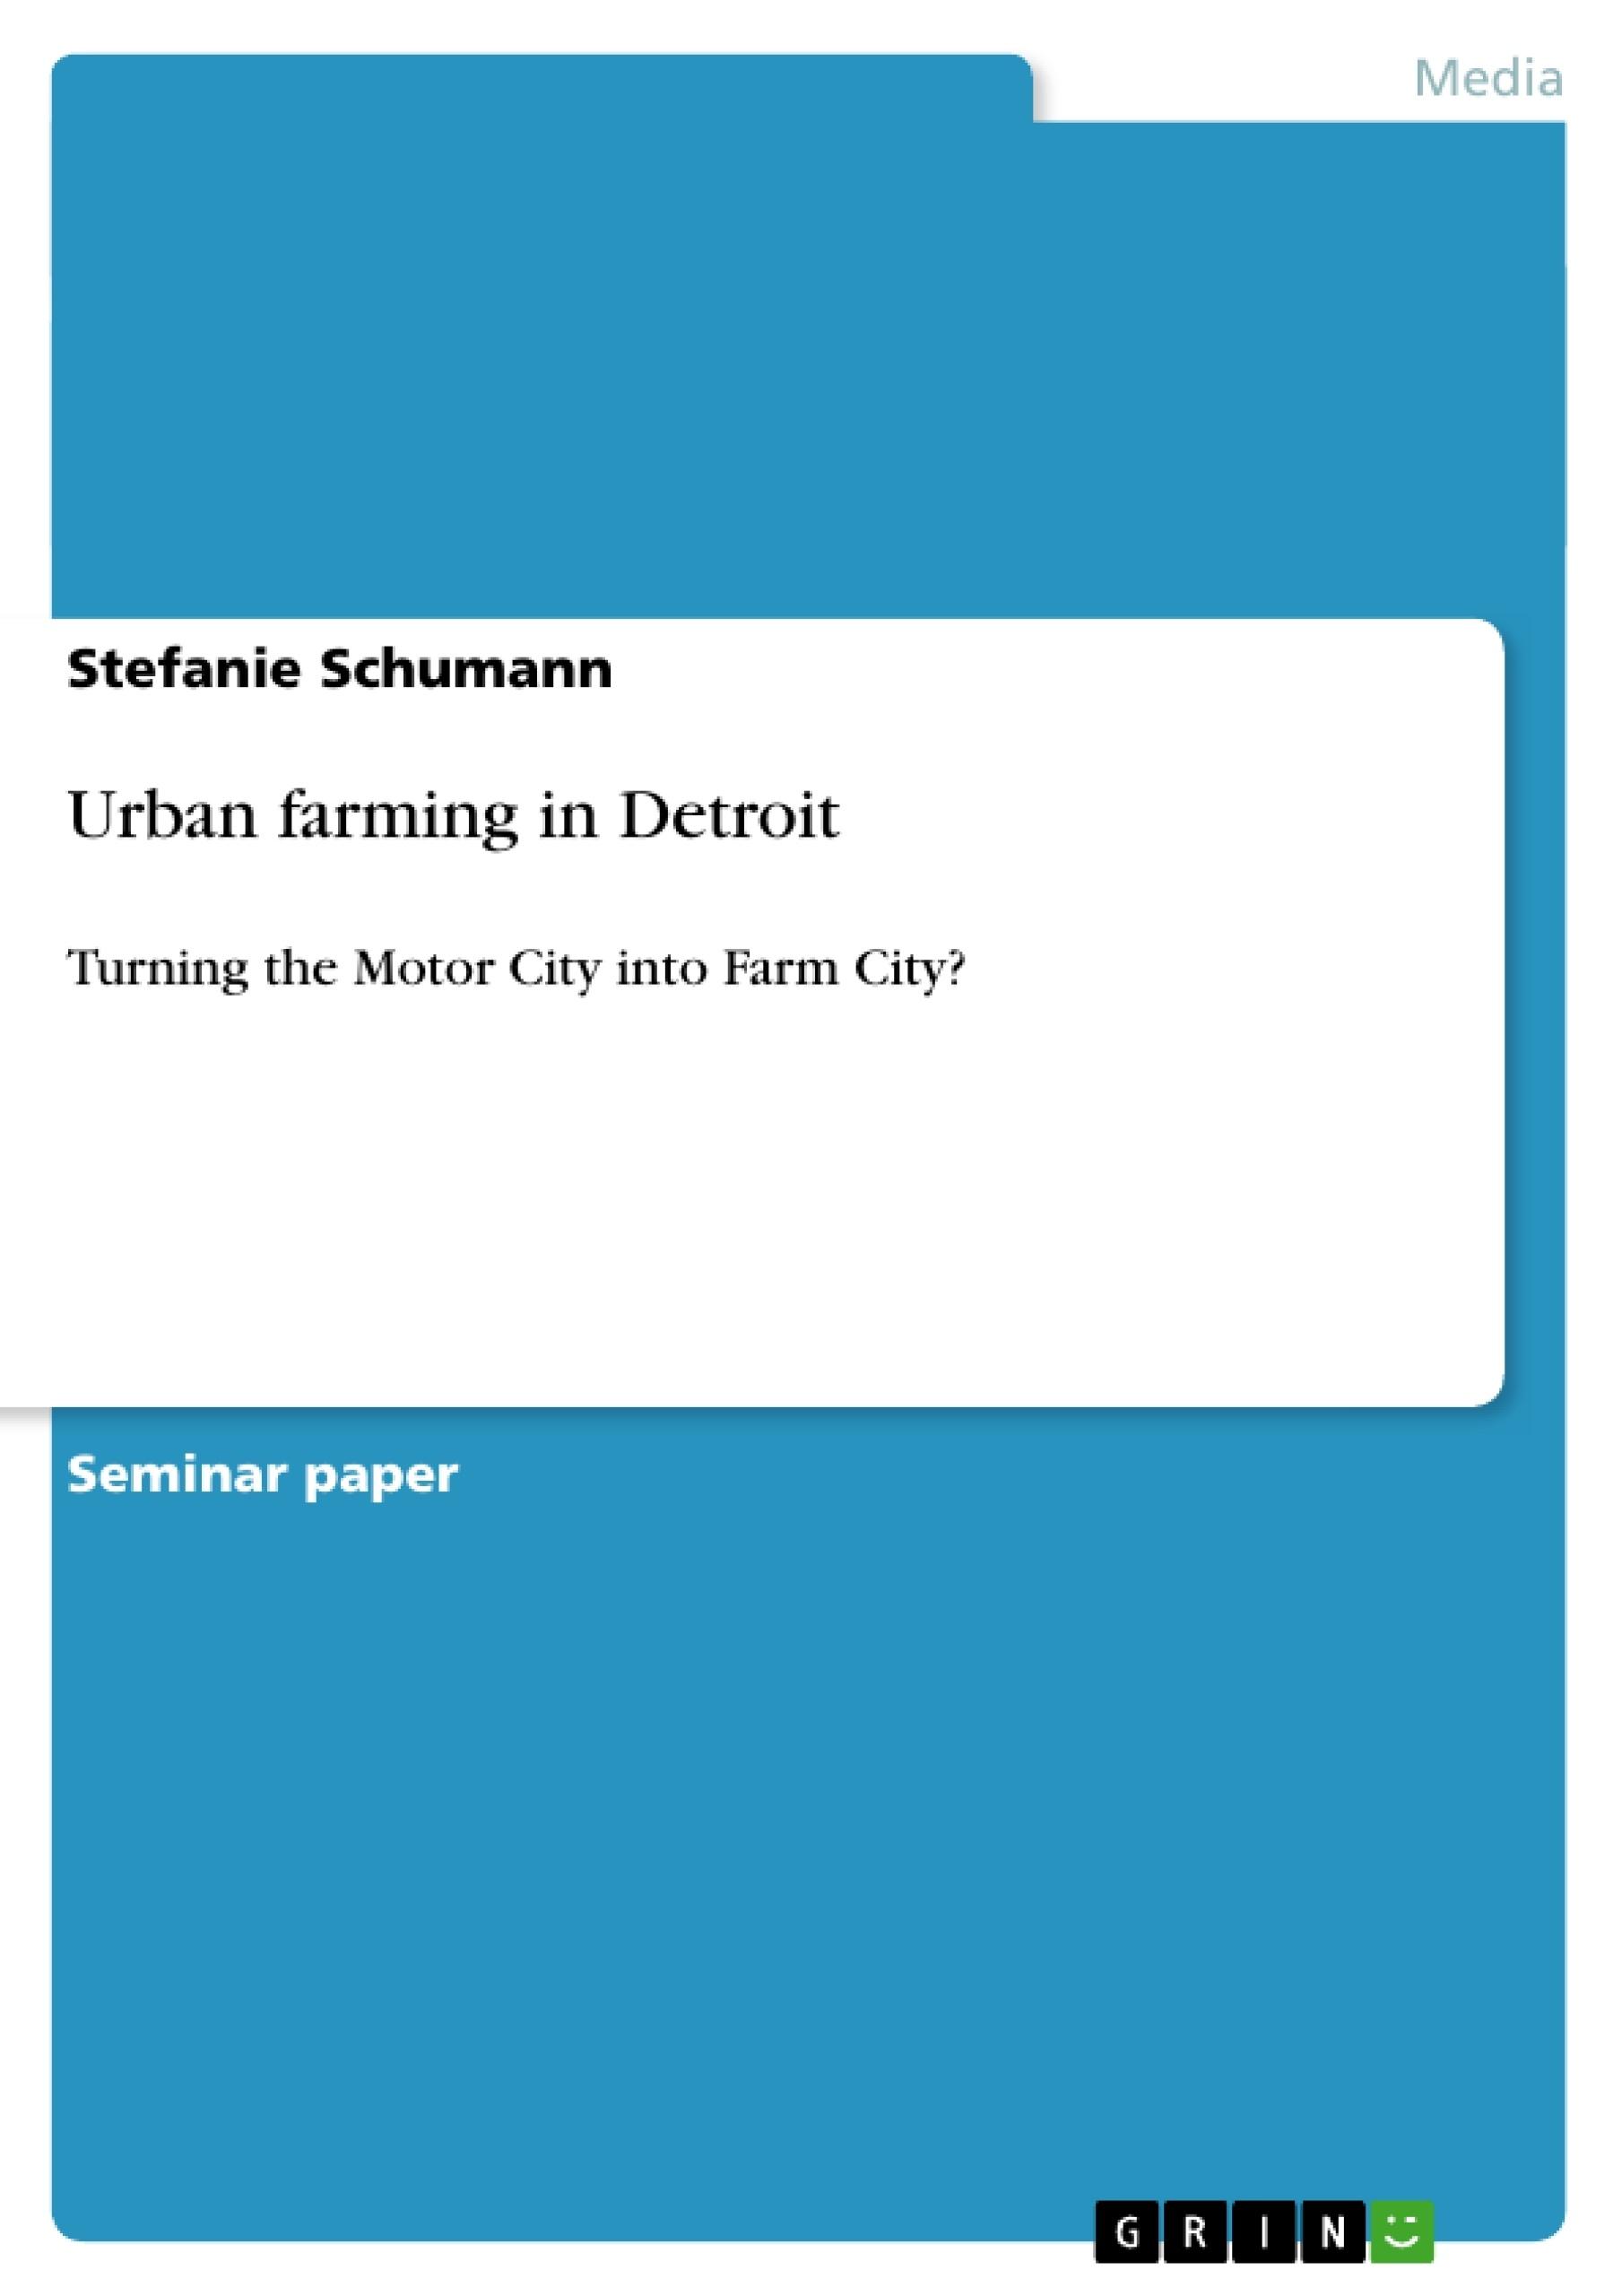 Title: Urban farming in Detroit